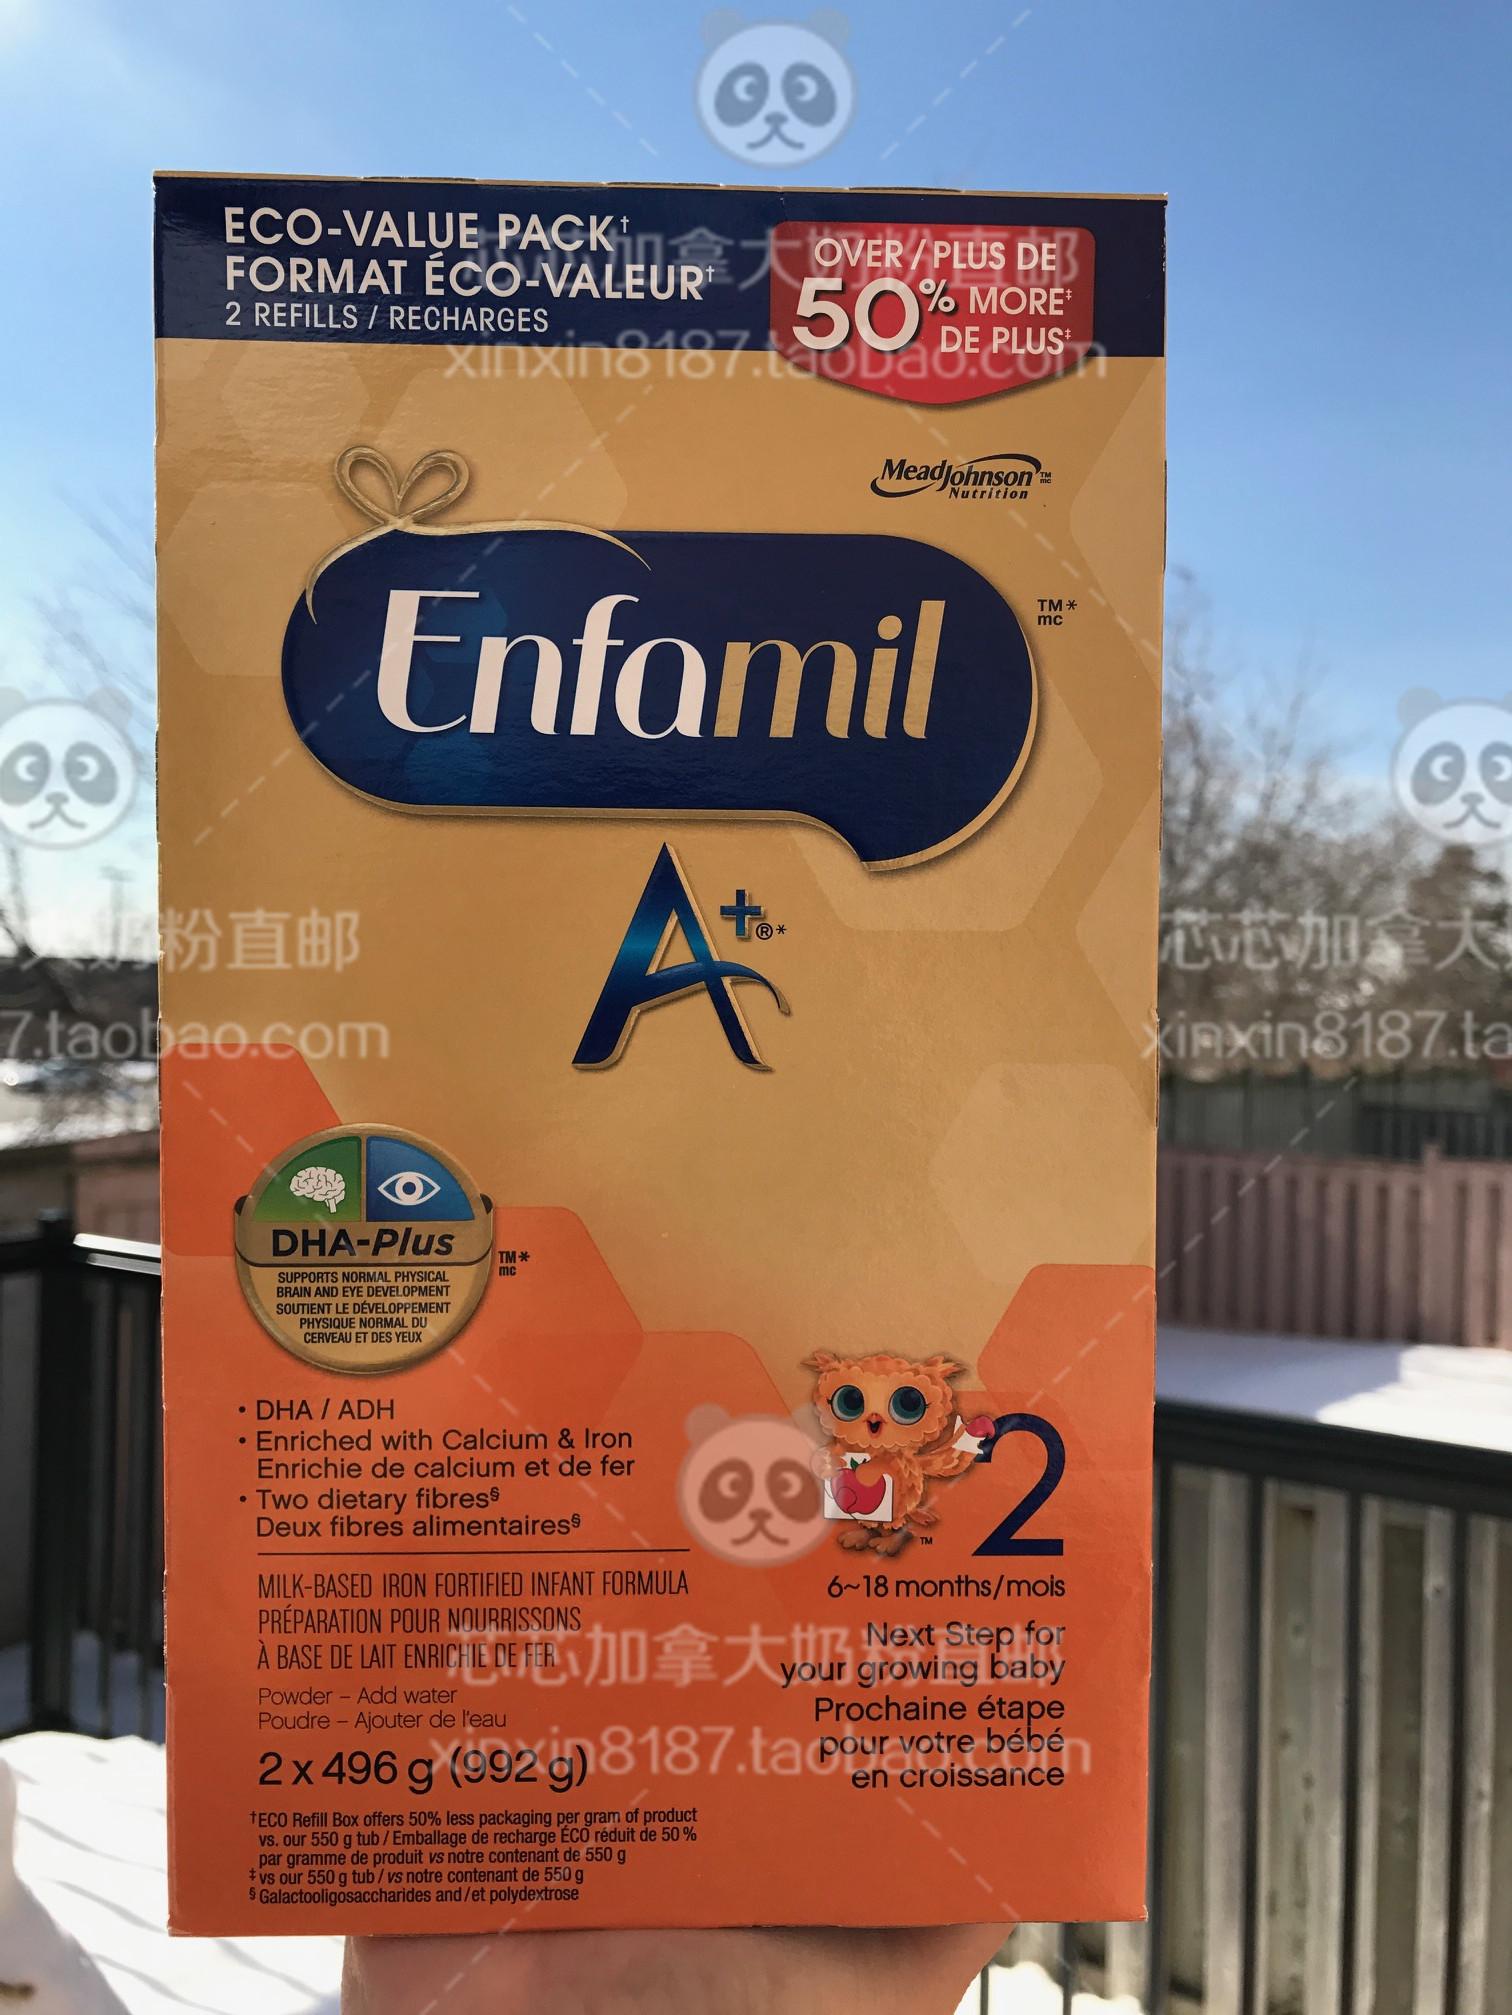 Mjn China: [USD 77.72] Canada Mead Johnson 2 Paragraph Milk Powder